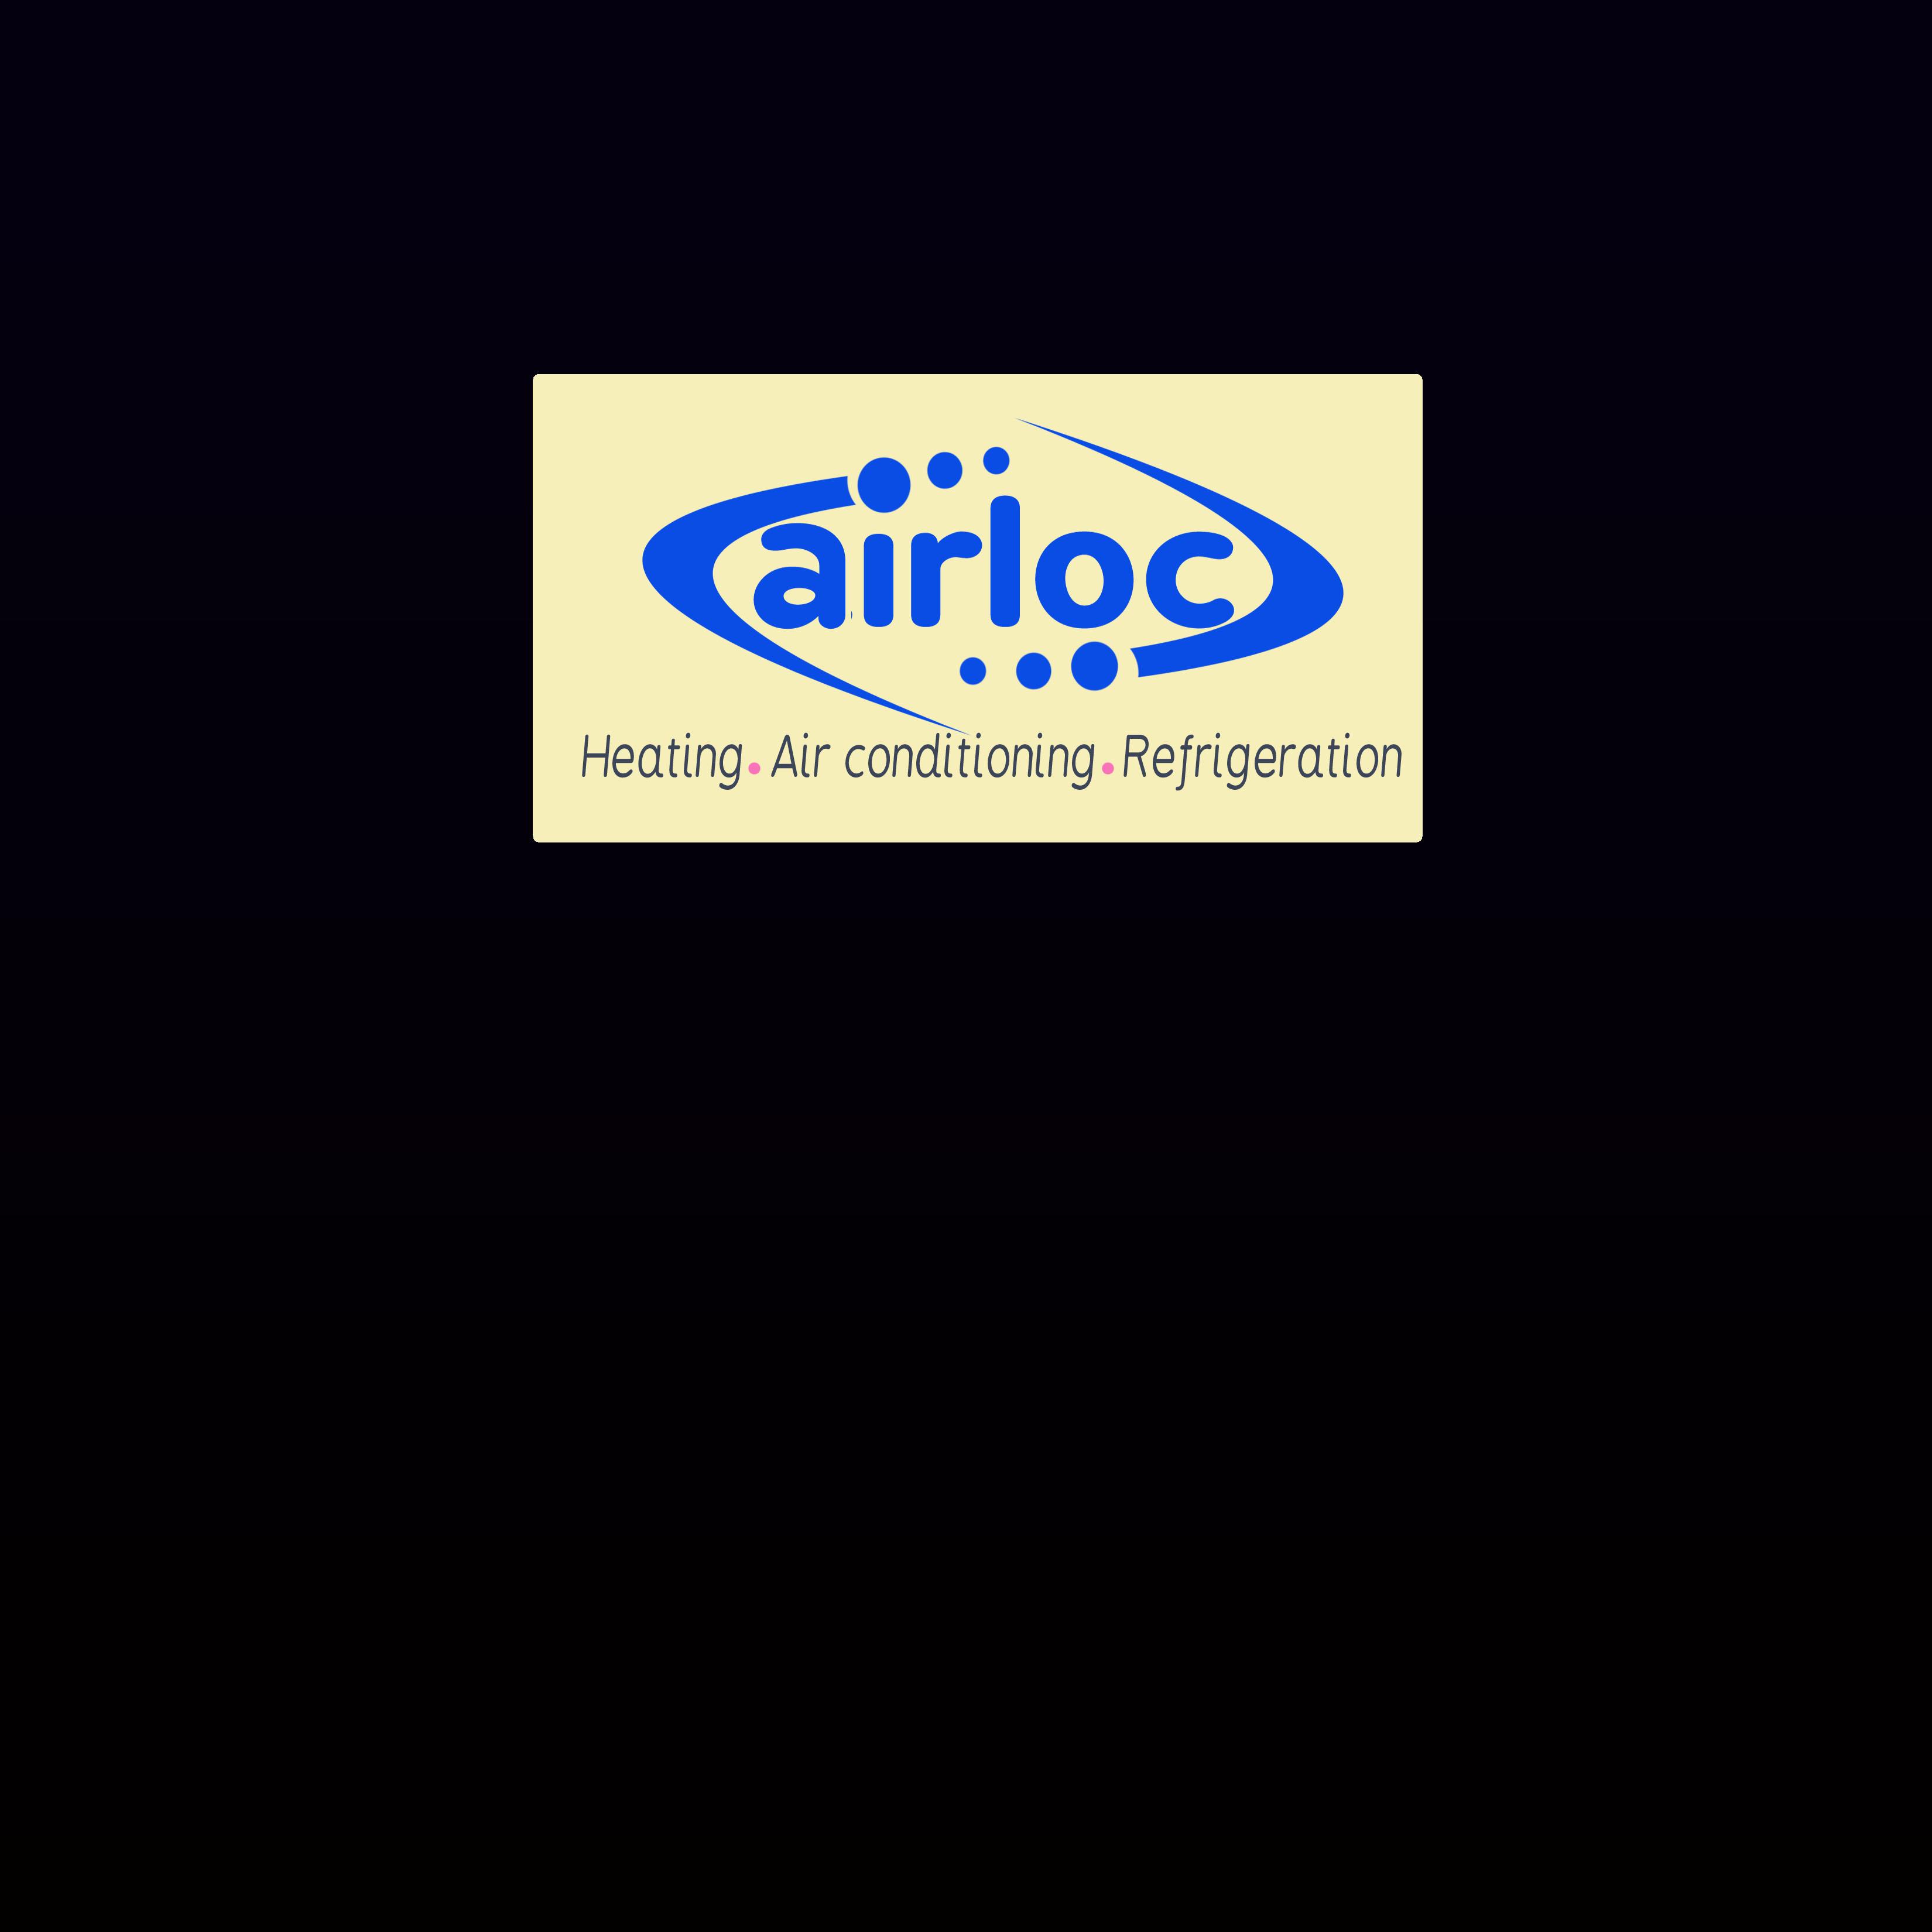 Logo Design by Allan Esclamado - Entry No. 199 in the Logo Design Contest Airloc Logo Design.